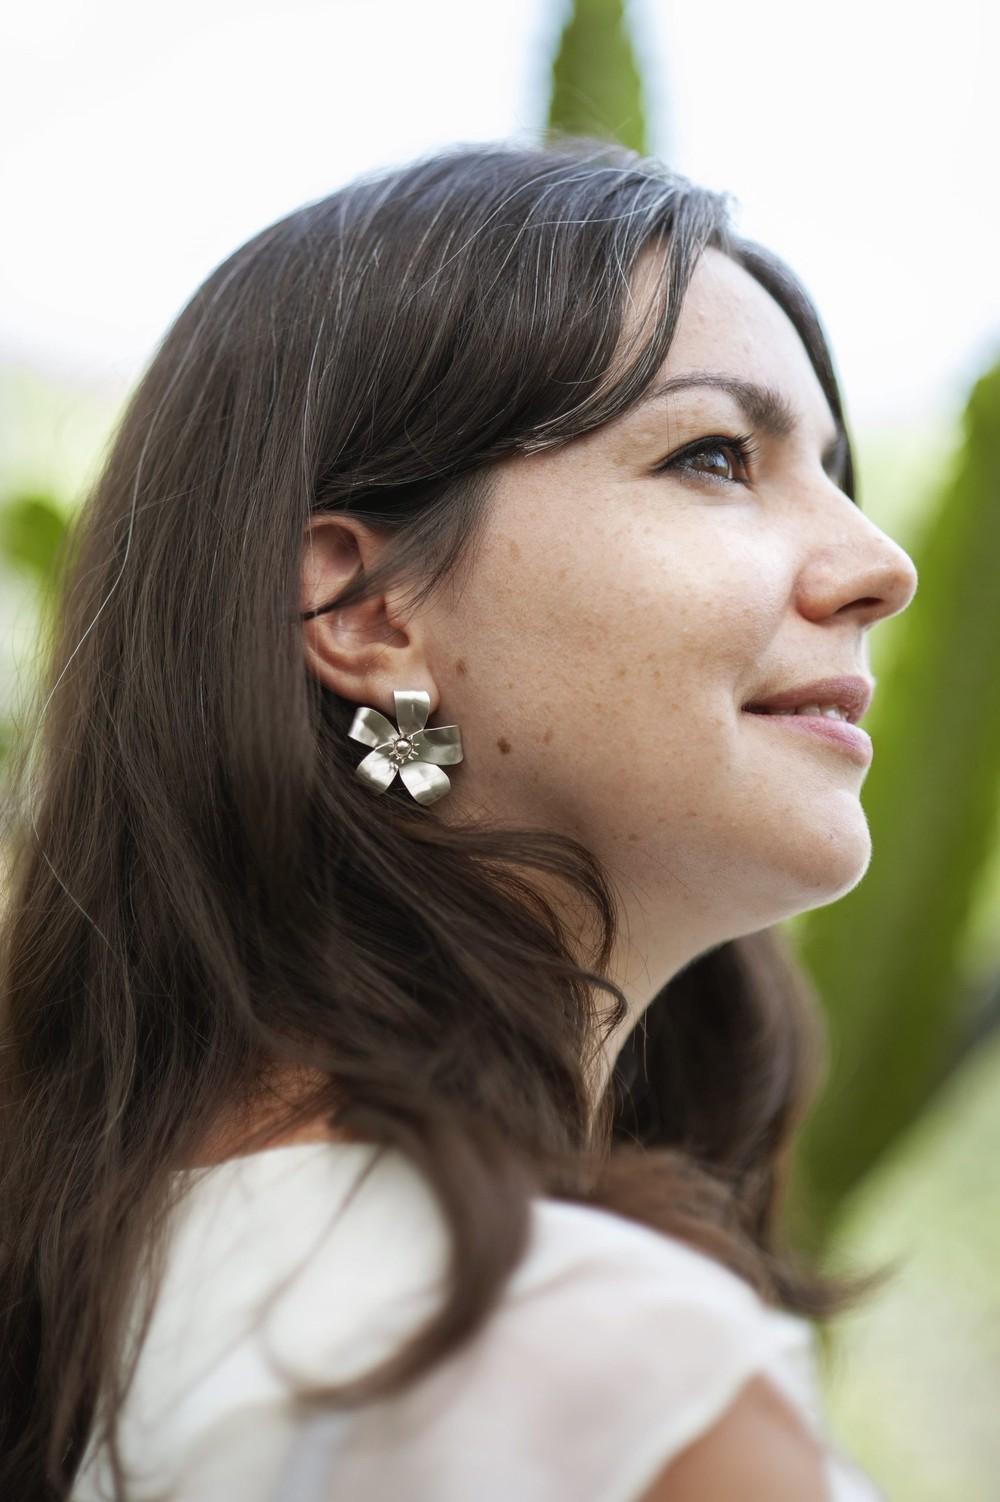 Boucles d'oreilles murraya - Elle & Sens